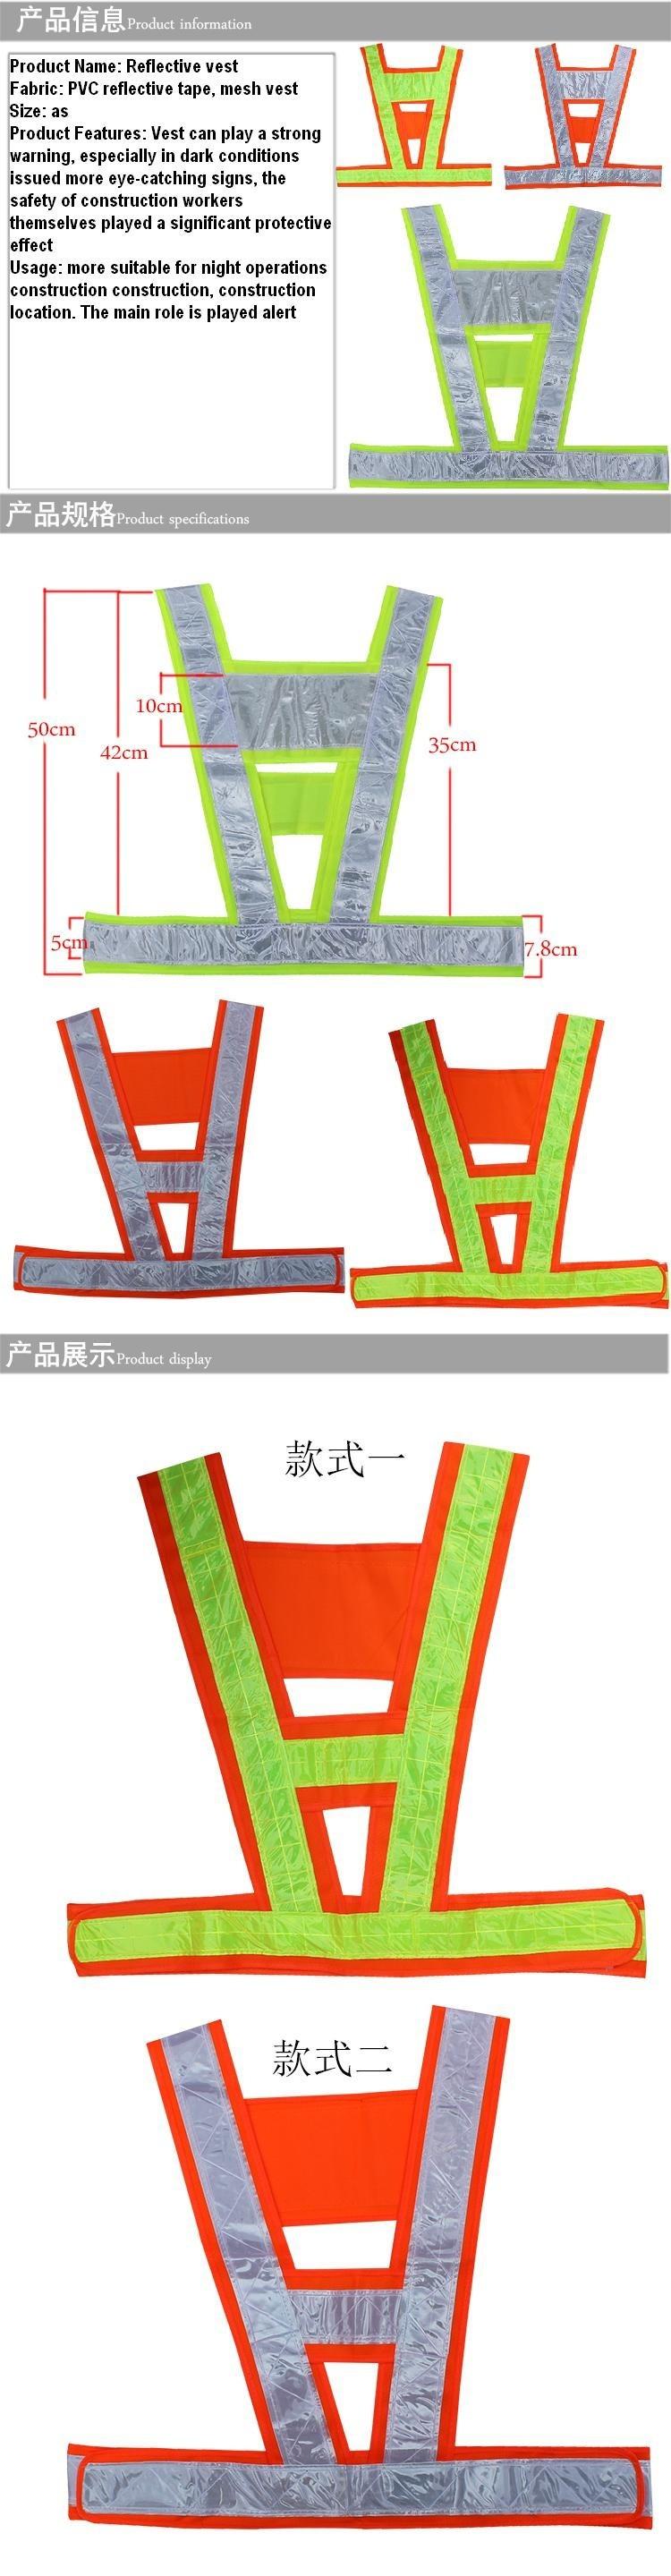 Защитная одежда N 2 V 1015